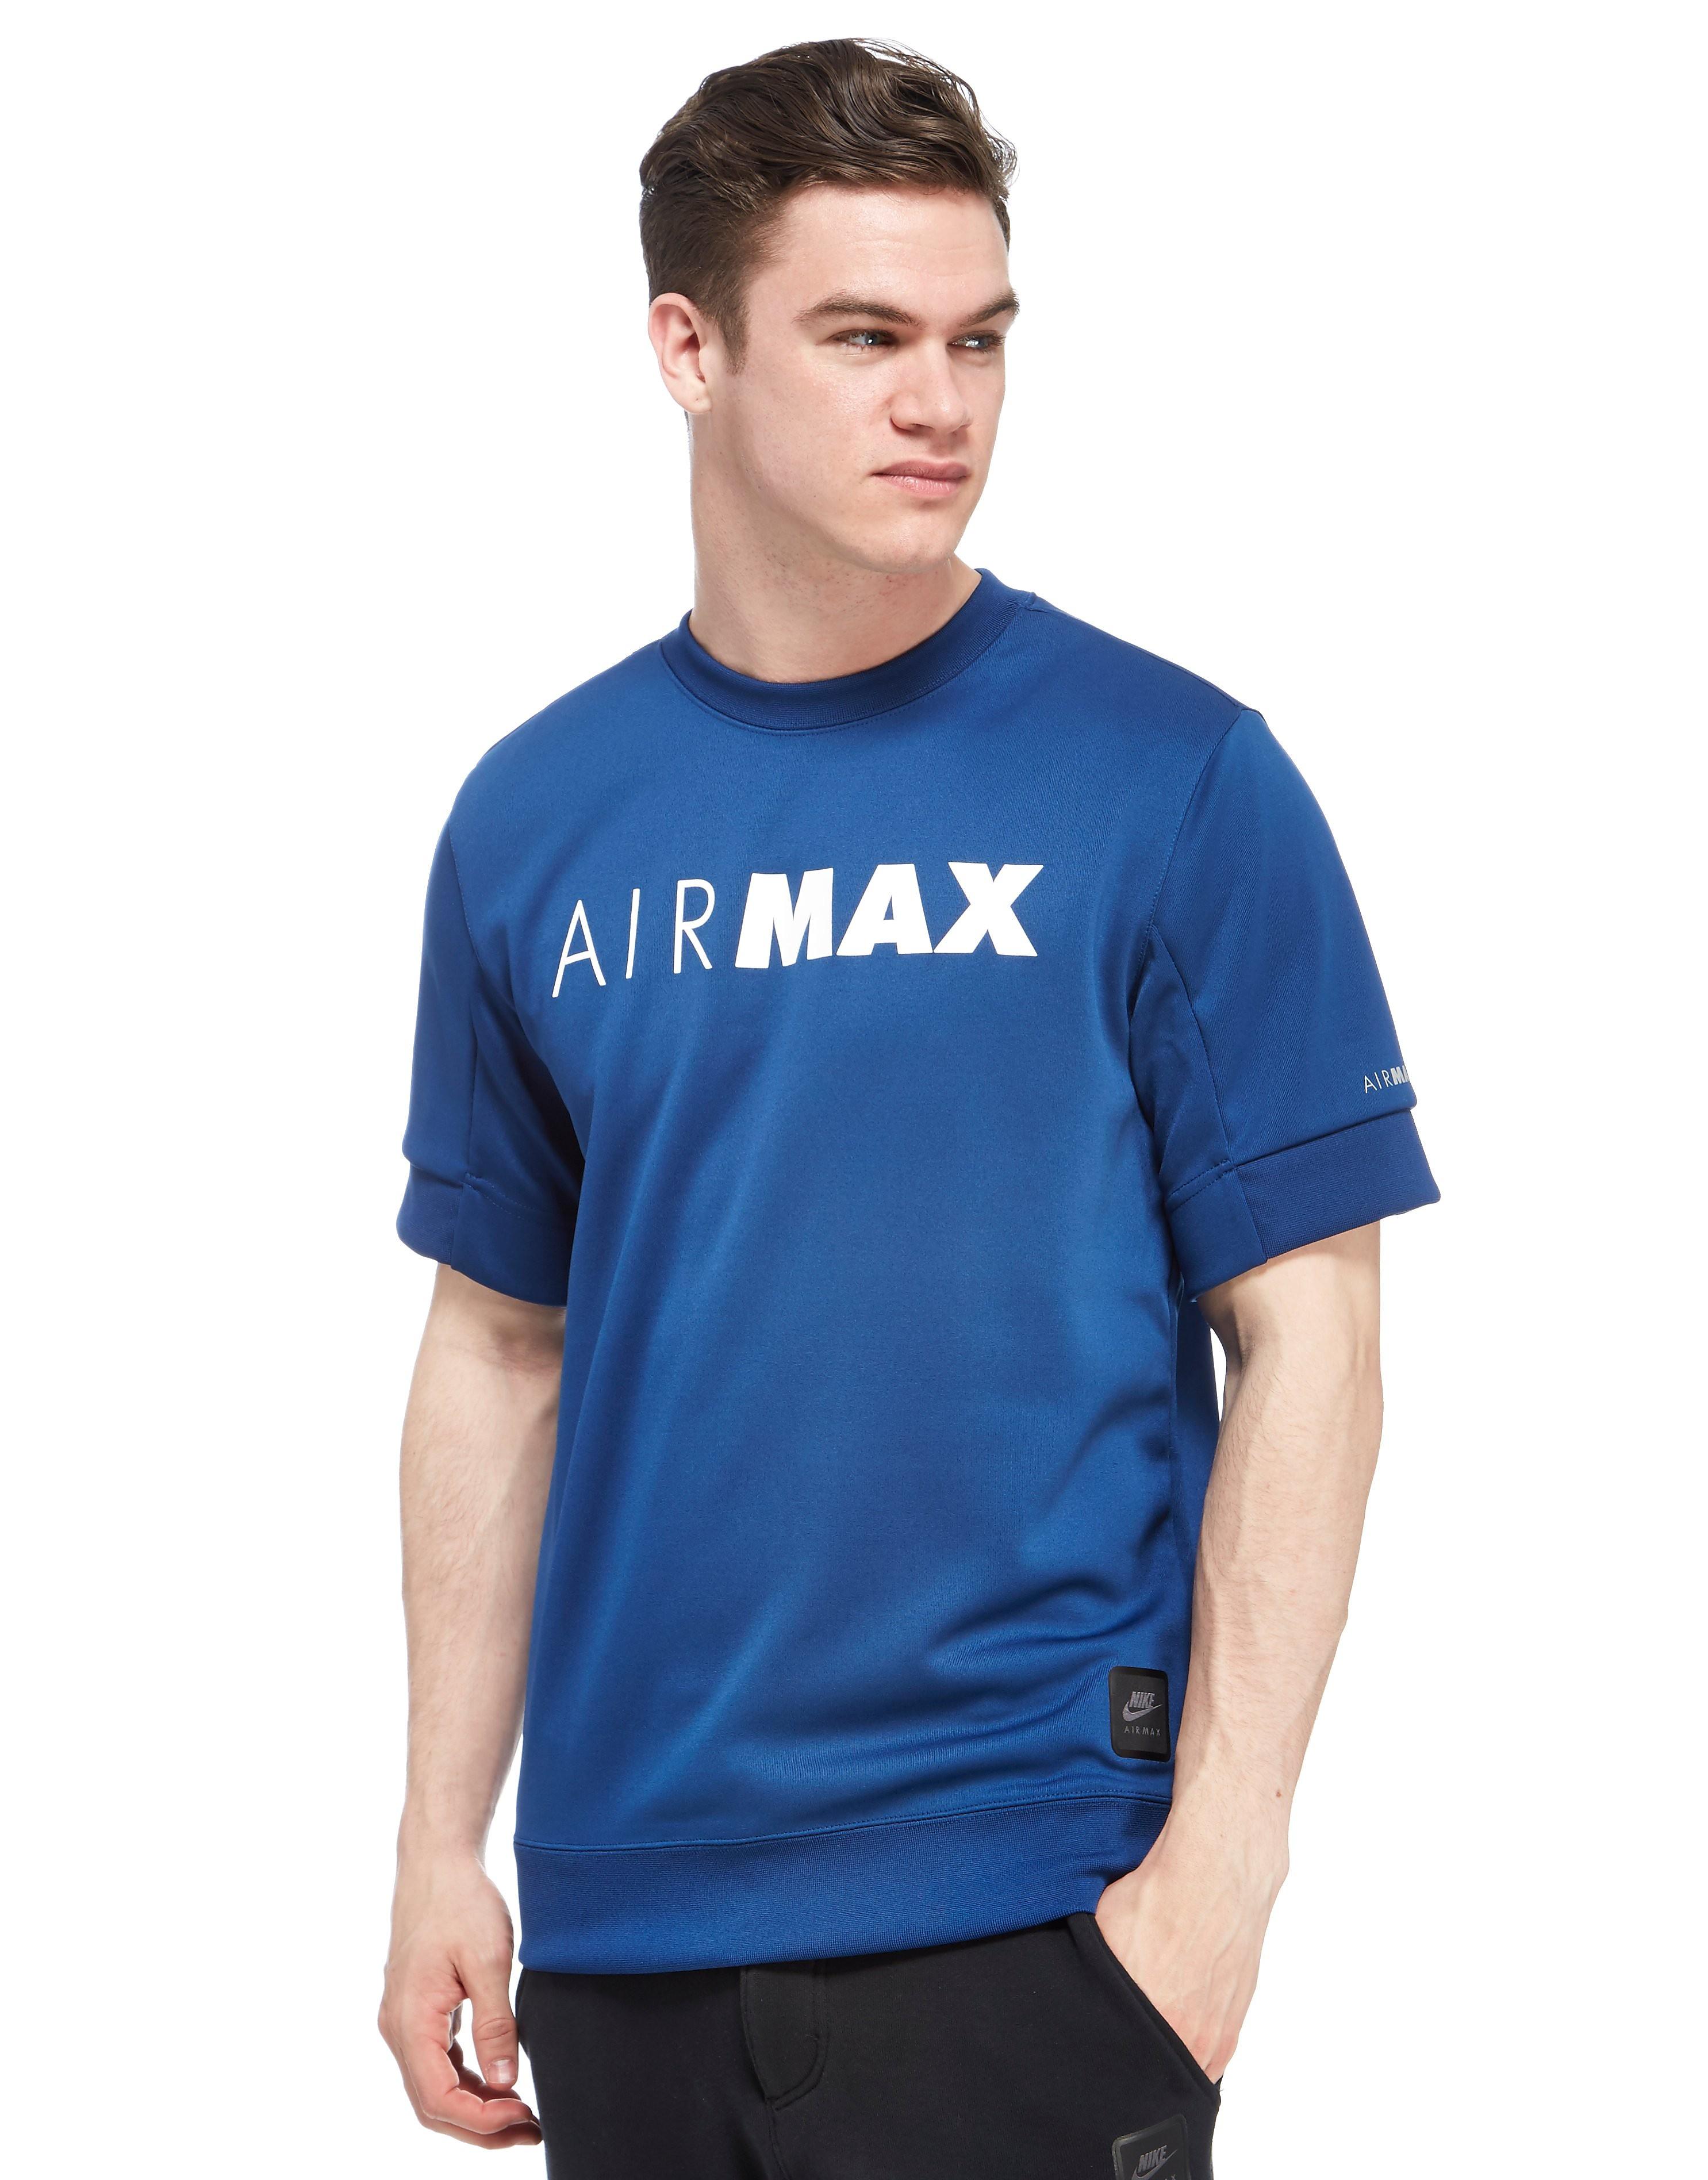 Nike Air Max Short Sleeve Sweatshirt BlueWhite Mens